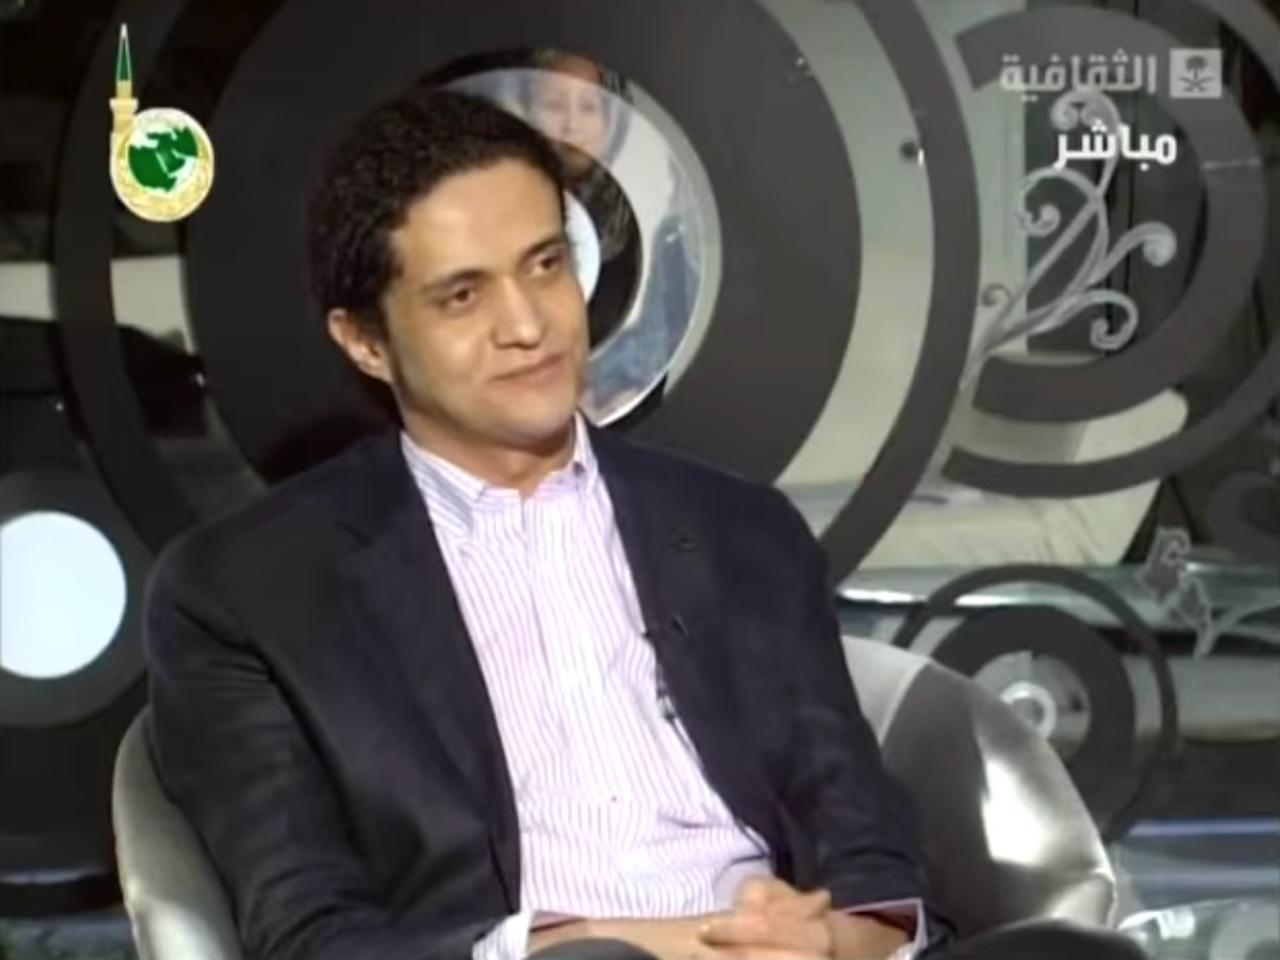 Ashraf Fayadh in a 2013 interview on Saudi television (screenshot via YouTube)